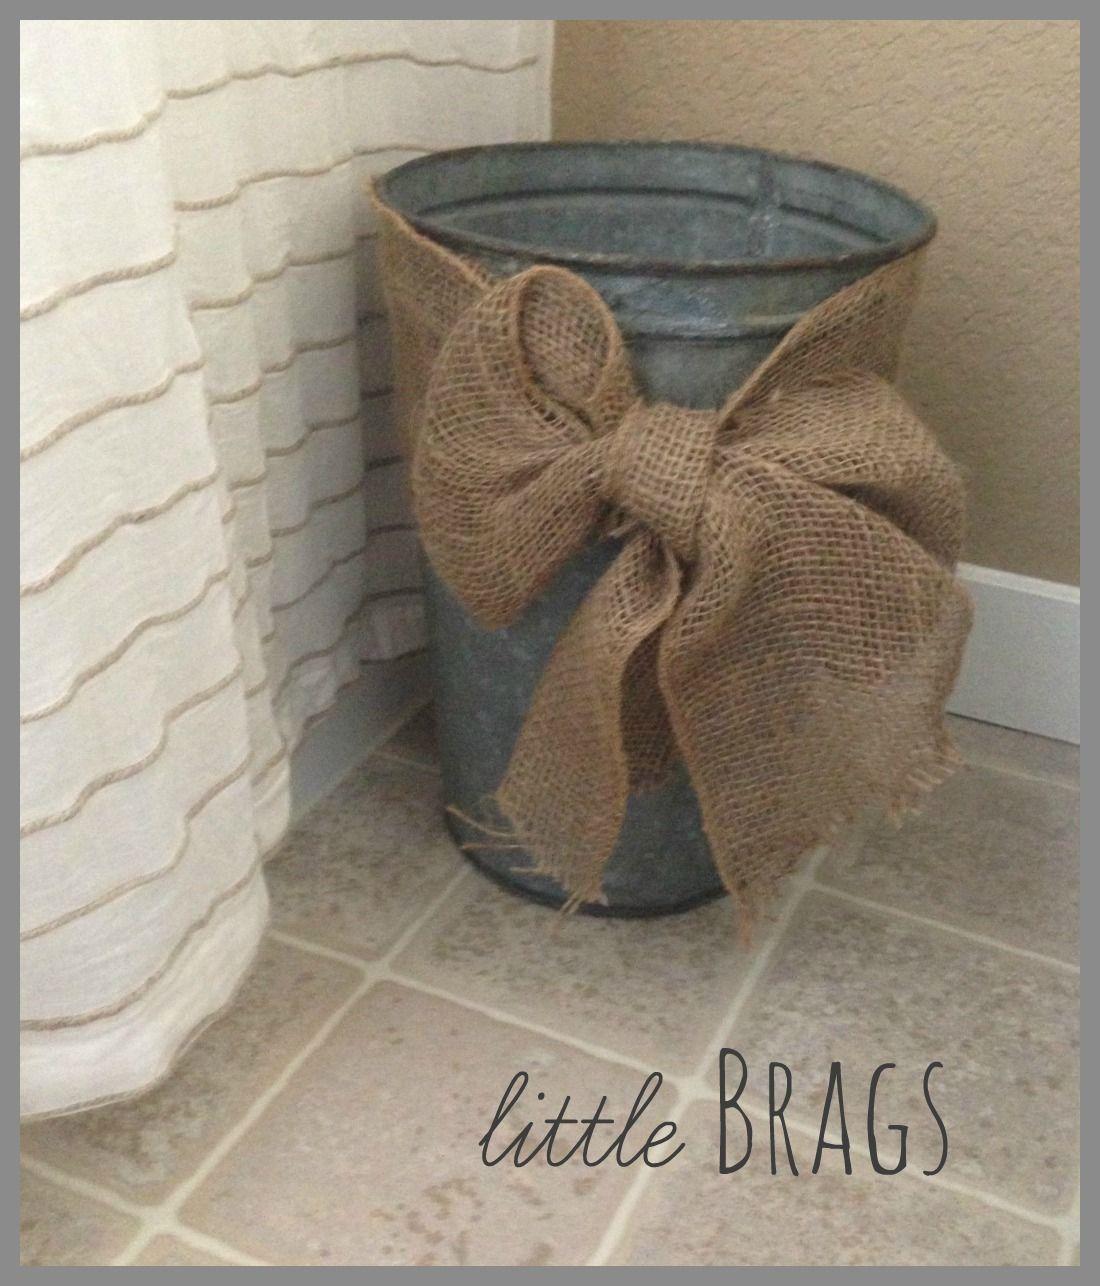 Little Brags Guest Bedroom And Rusty Buckets Burlap Bathroom Primitive Bathrooms Shabby Chic Bathroom